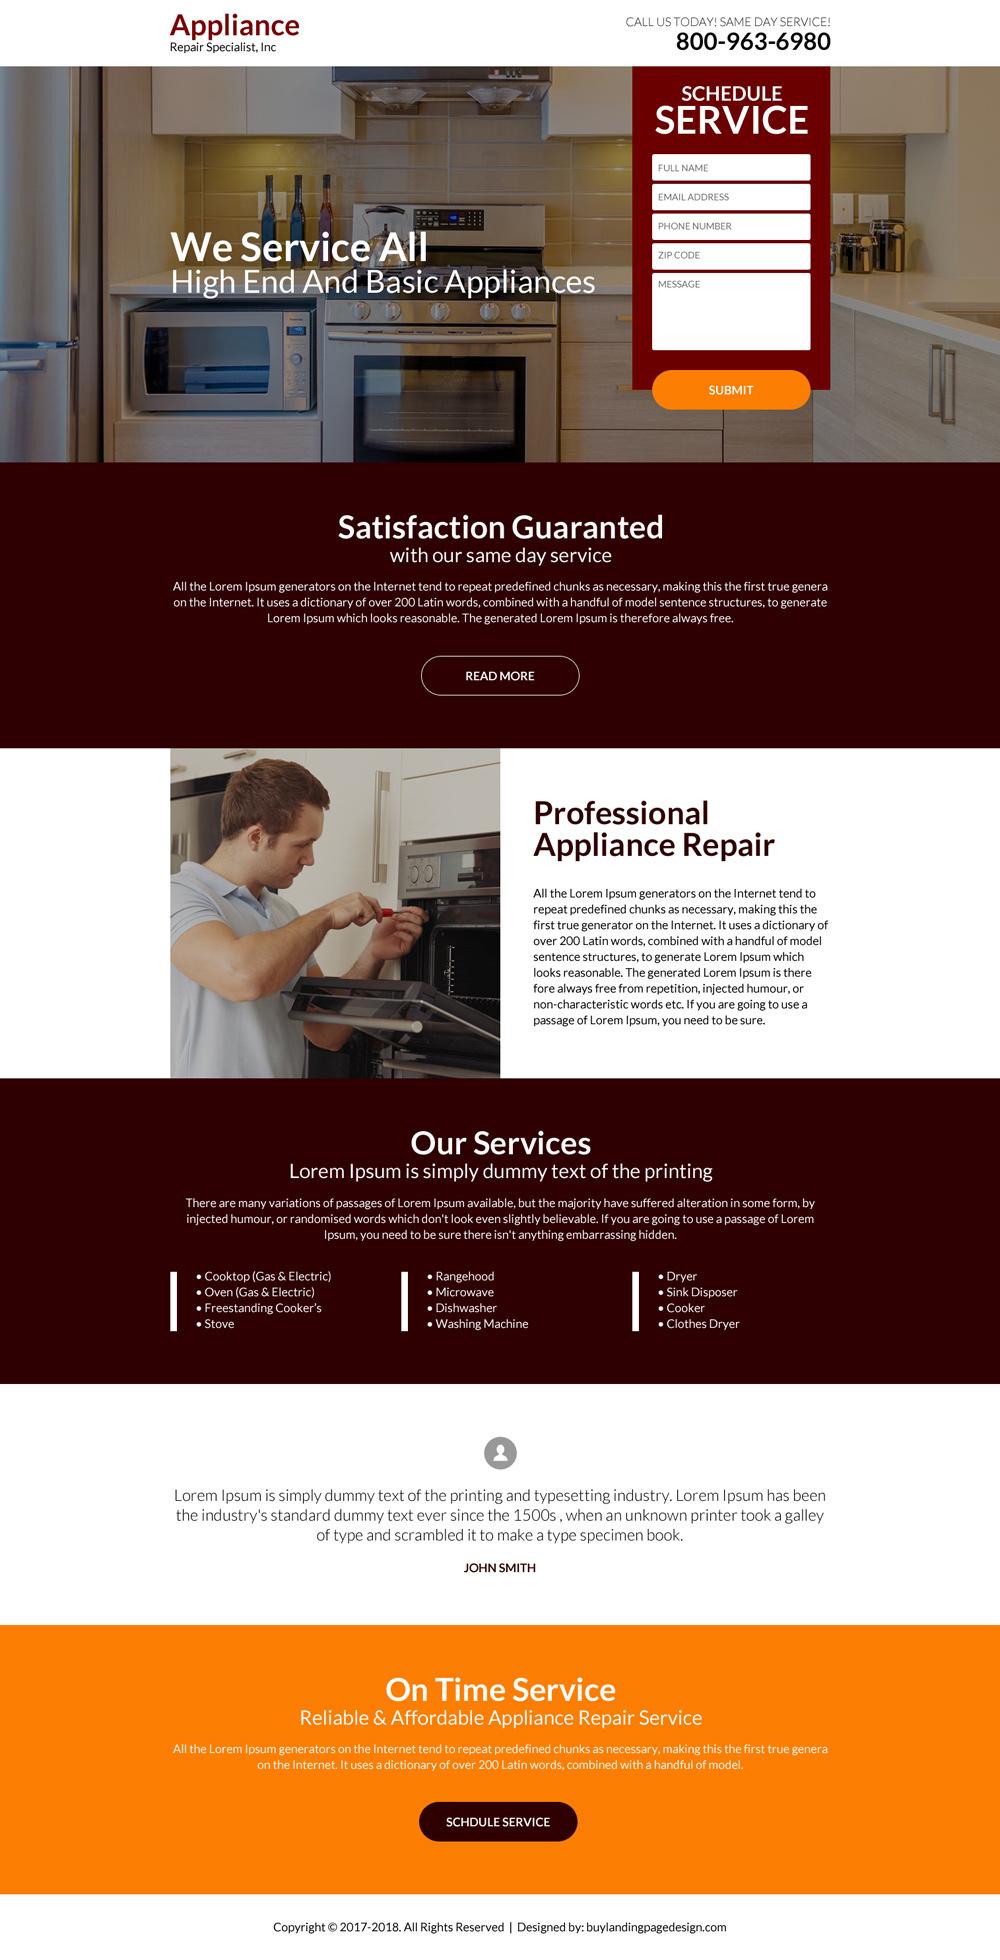 General Appliance Repair Appliance Repair Service Lead Capture Landing Page Designs